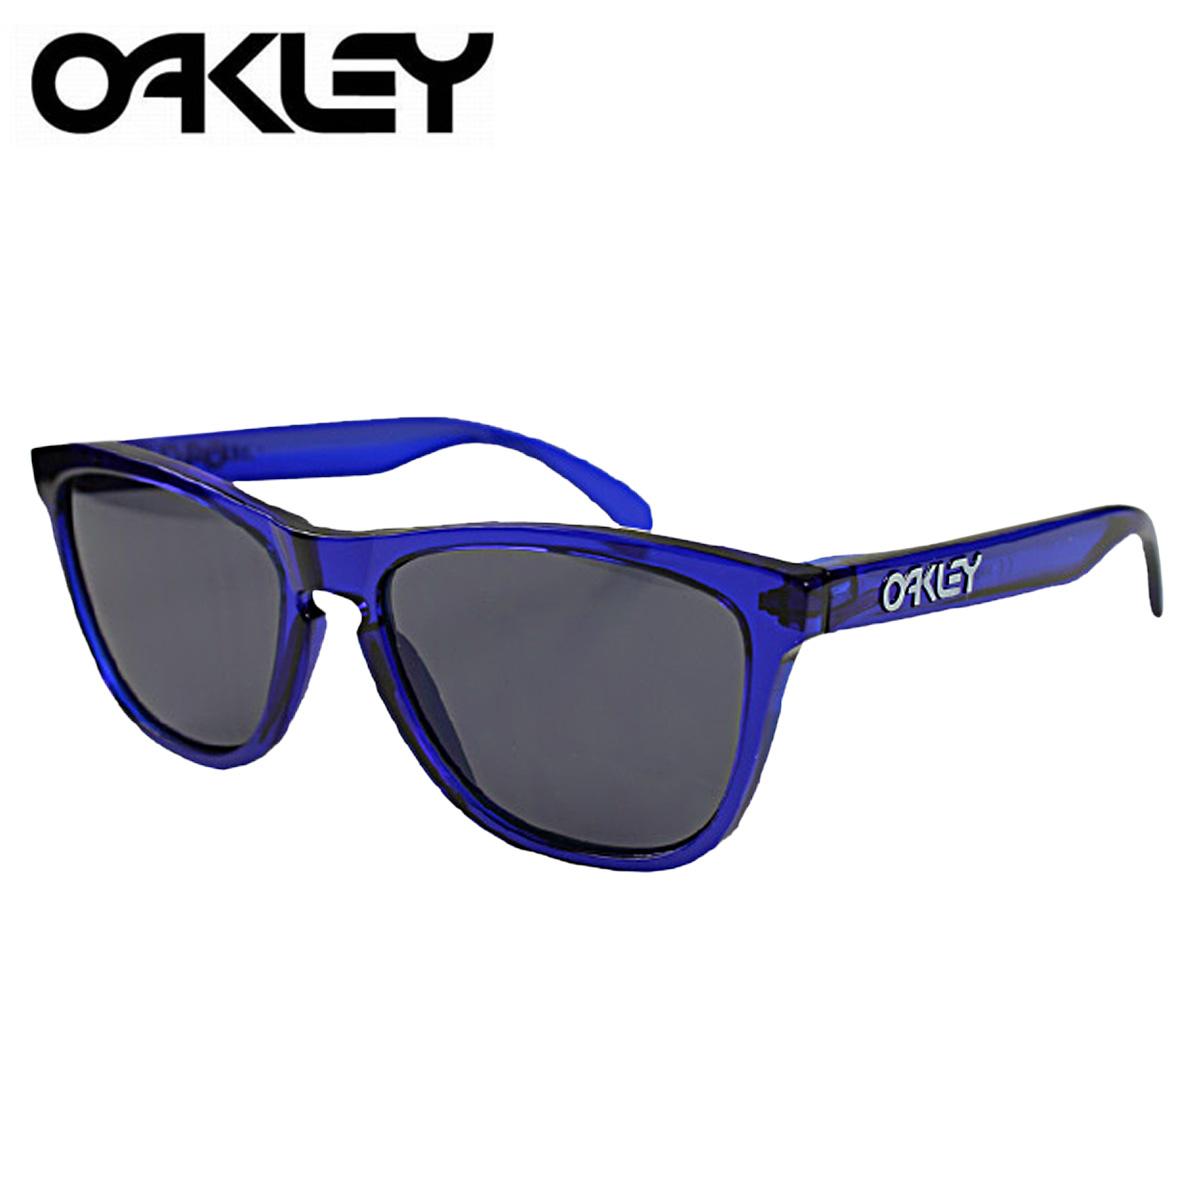 c8e12232d4 ... store sold out oakley oakley sunglasses frogskins frog skin glasses 24  243 dark blue men gap